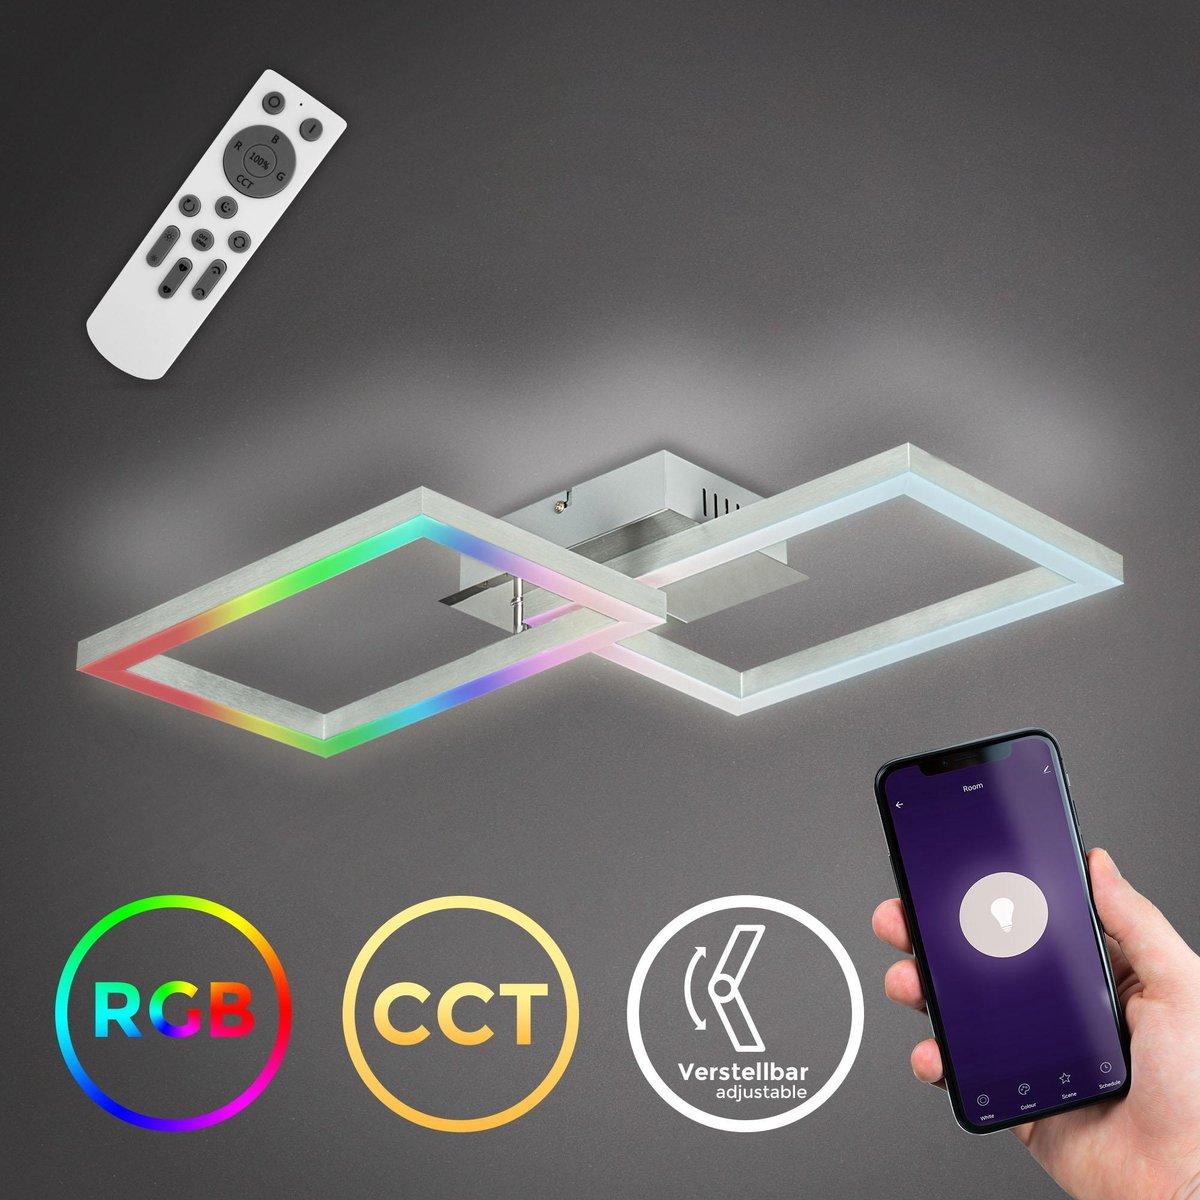 B.K.Licht - Slimme LED FRAME lamp - Plafondlamp smart - 38x50 cm - WiFi Plafonière - CCT - 2500-6500 Kelvin - RGB - app en afstandsbediening - dimbaar - 30 Watt - Chroom-Aluminium